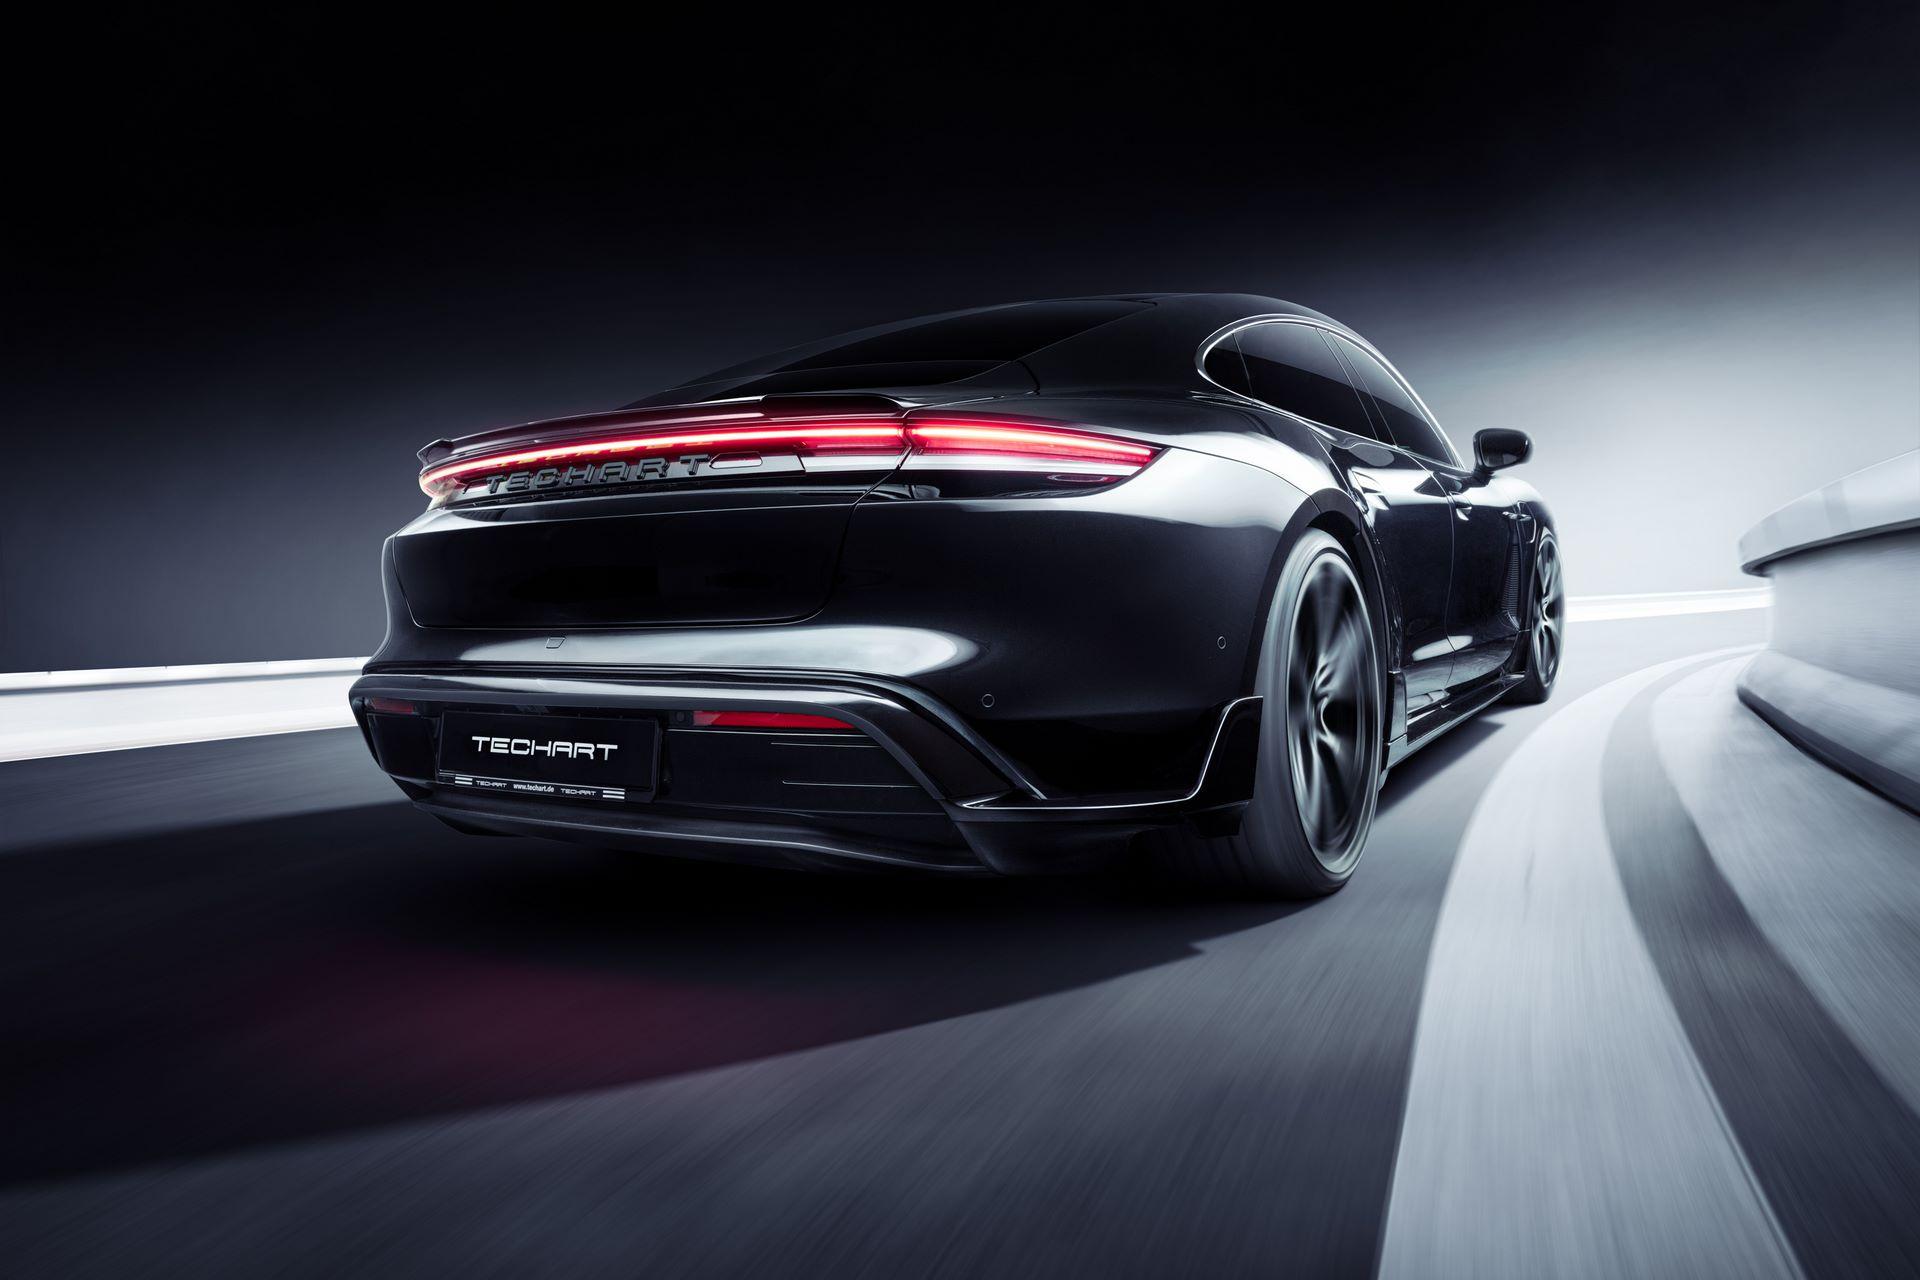 Porsche-Taycan-bodykit-by-TechArt-12